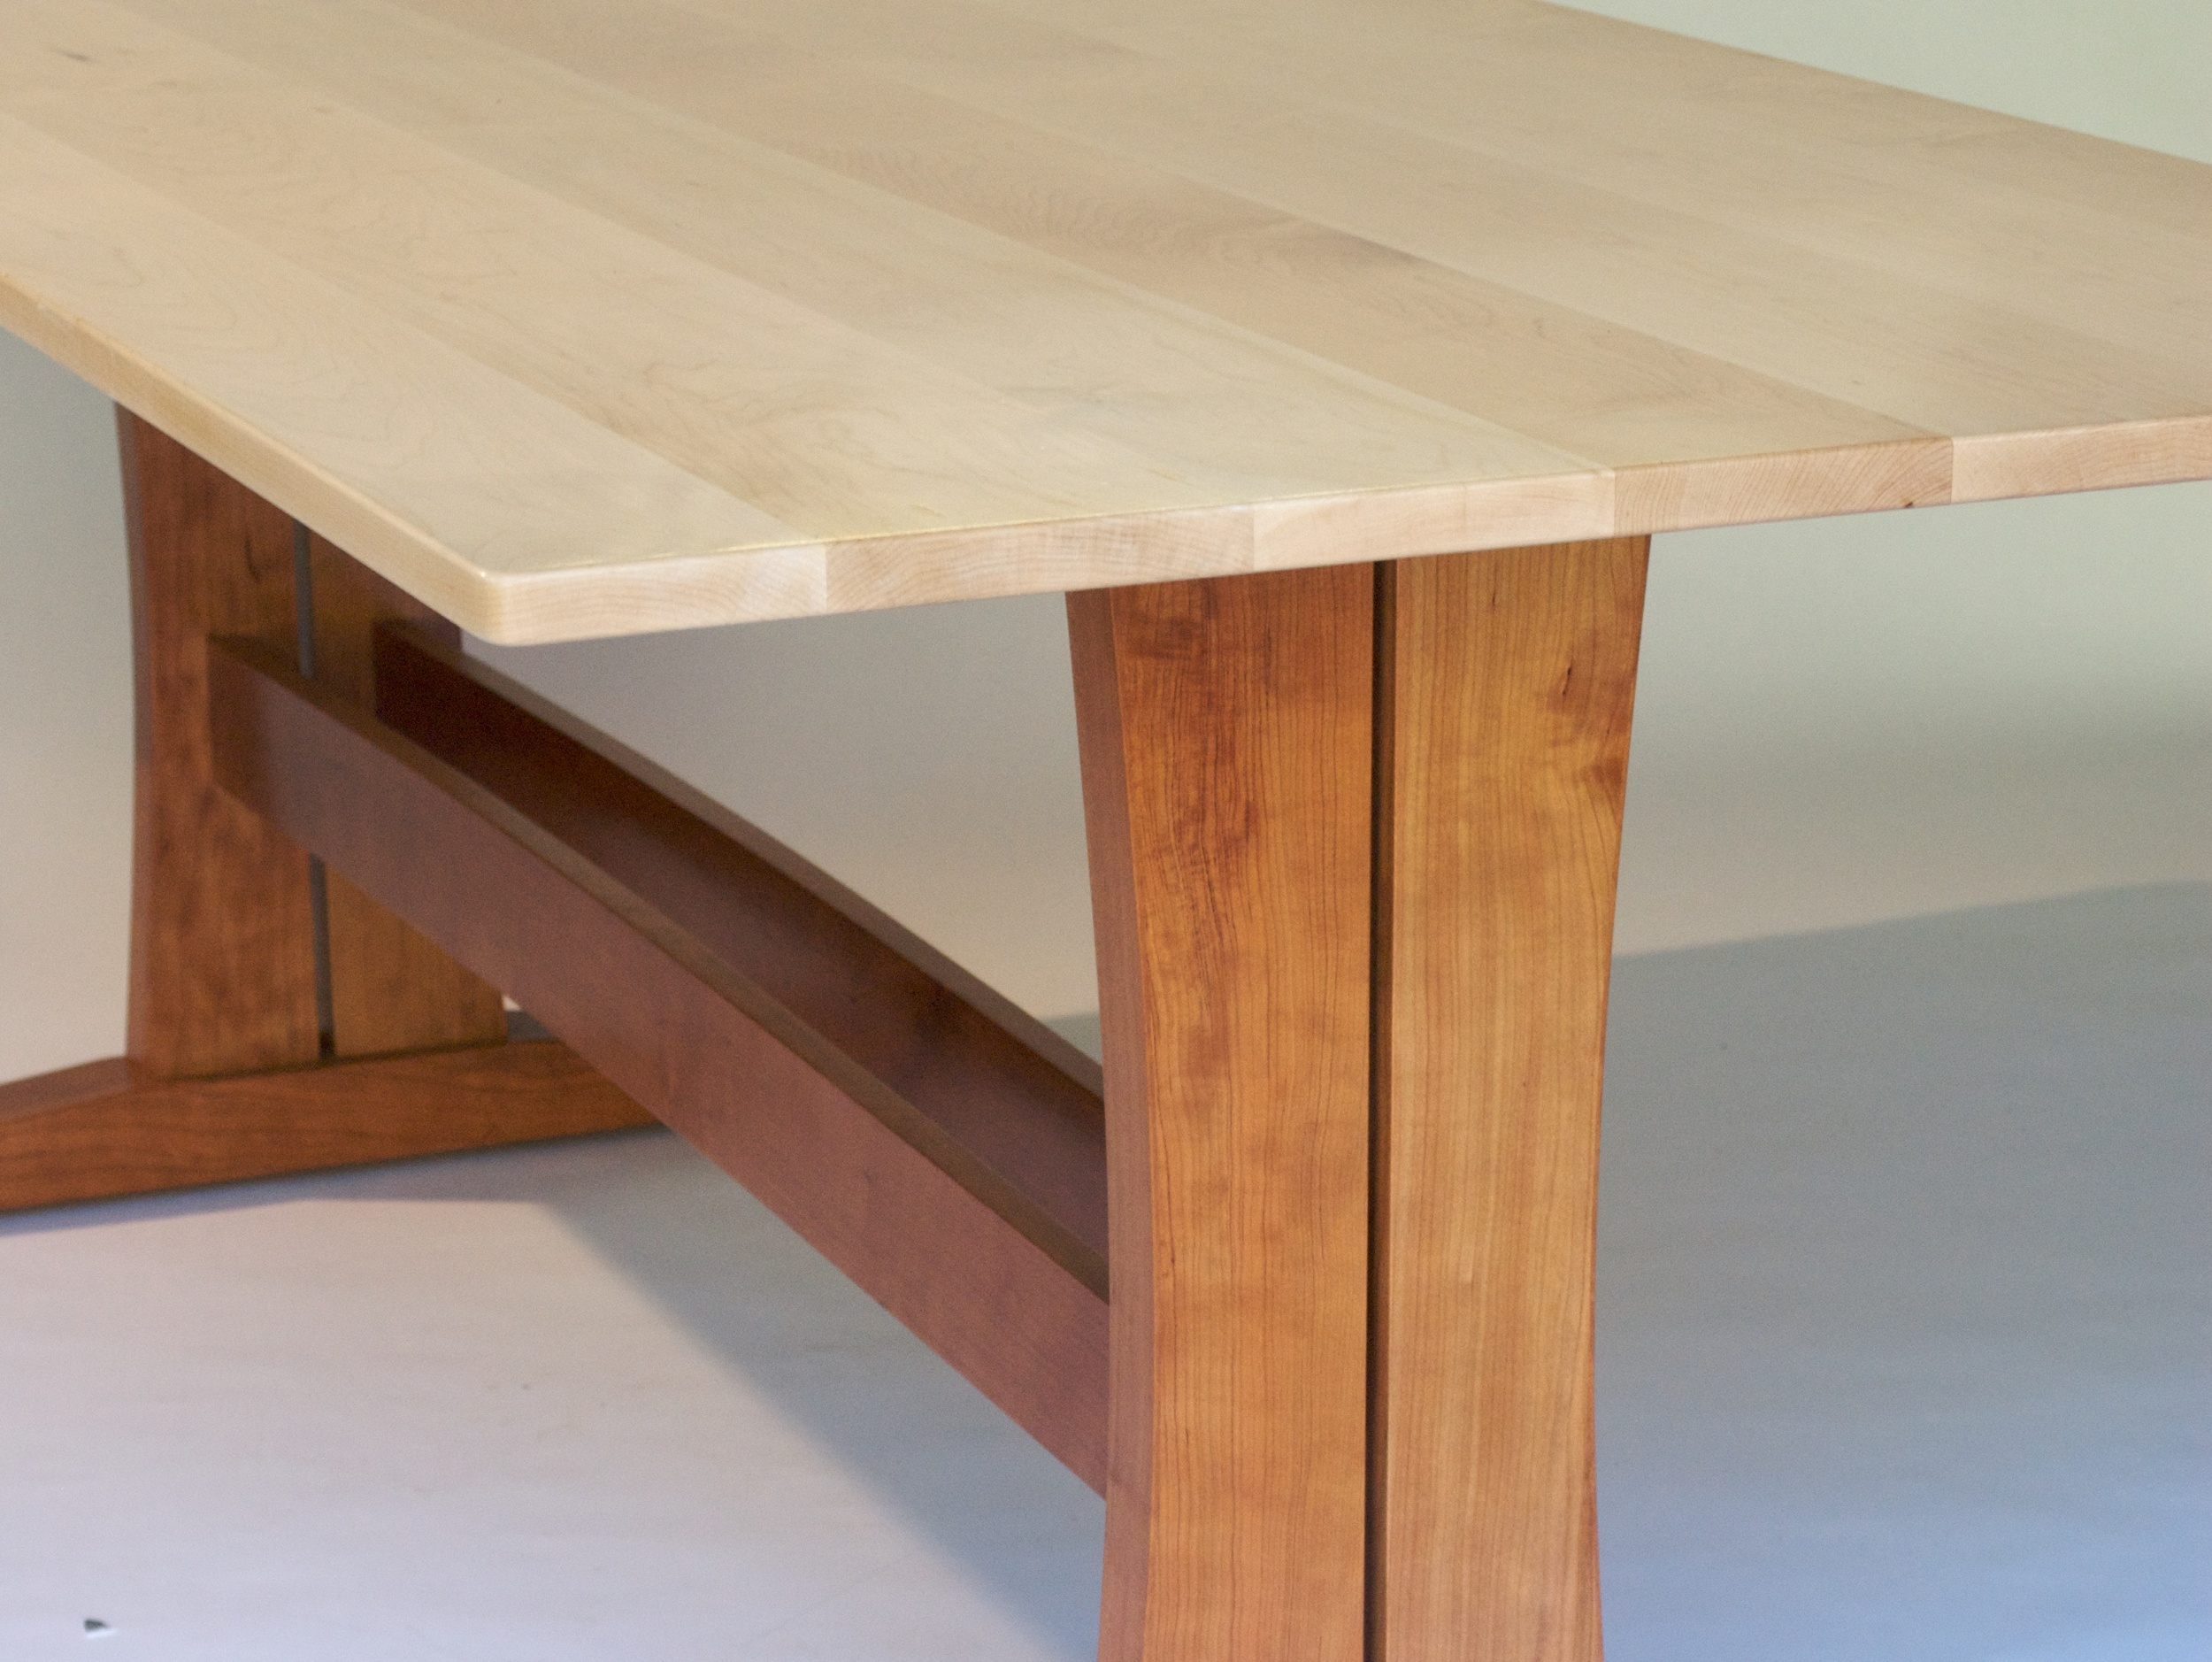 cohen table 21 - Version 3.jpg